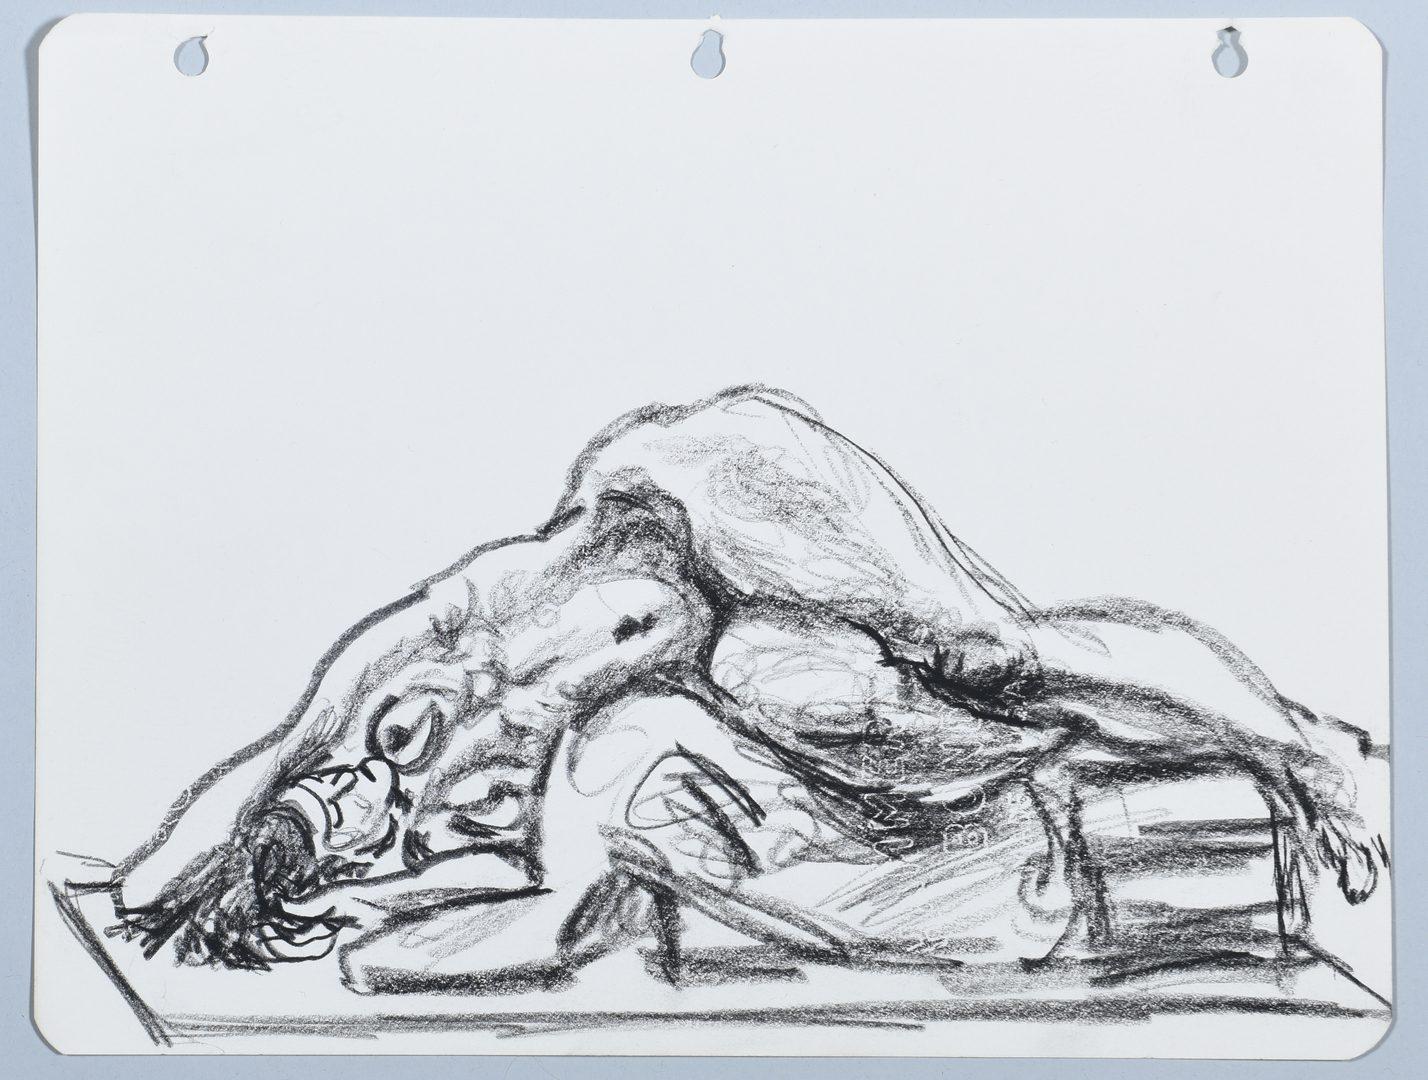 Lot 189: 6 Joseph Delaney Drawings & Alex Haley Letter